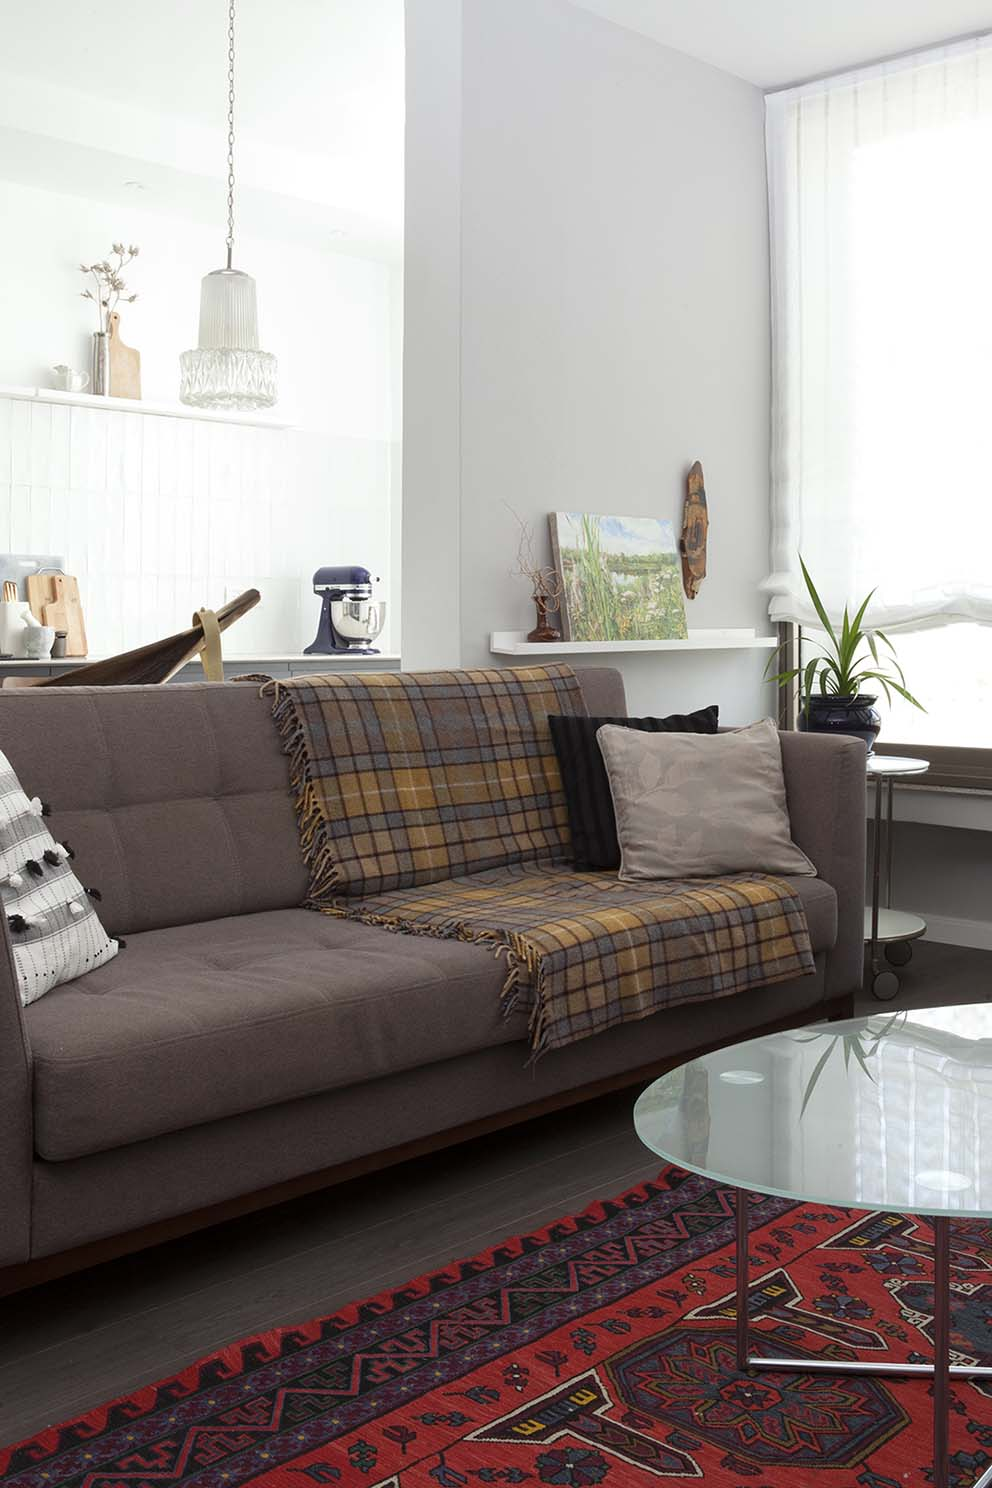 עיצוב: דיאנה סטארק, צילום: הגר דופלט, www.pnim.co.il